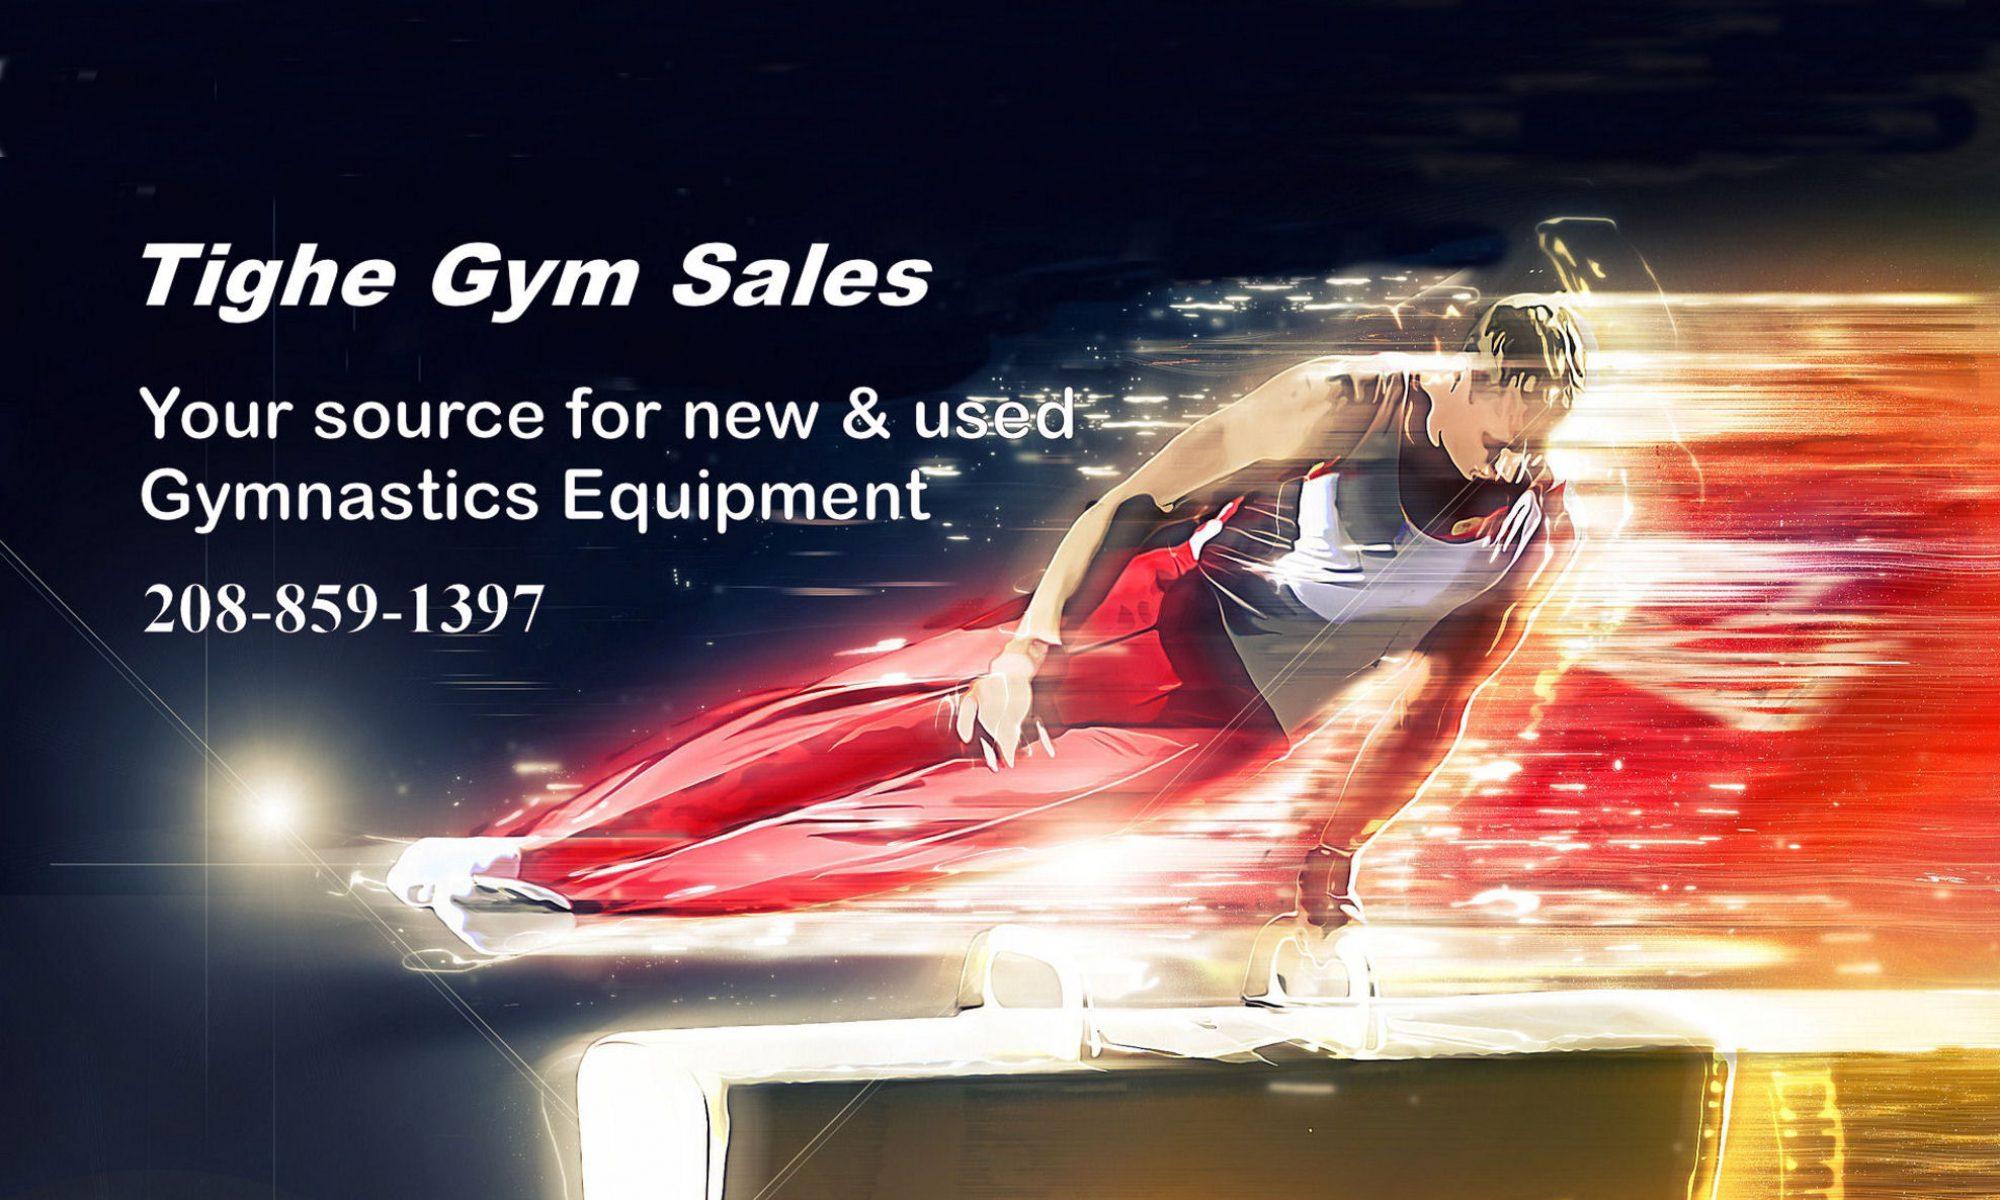 Tighe Gym Sales